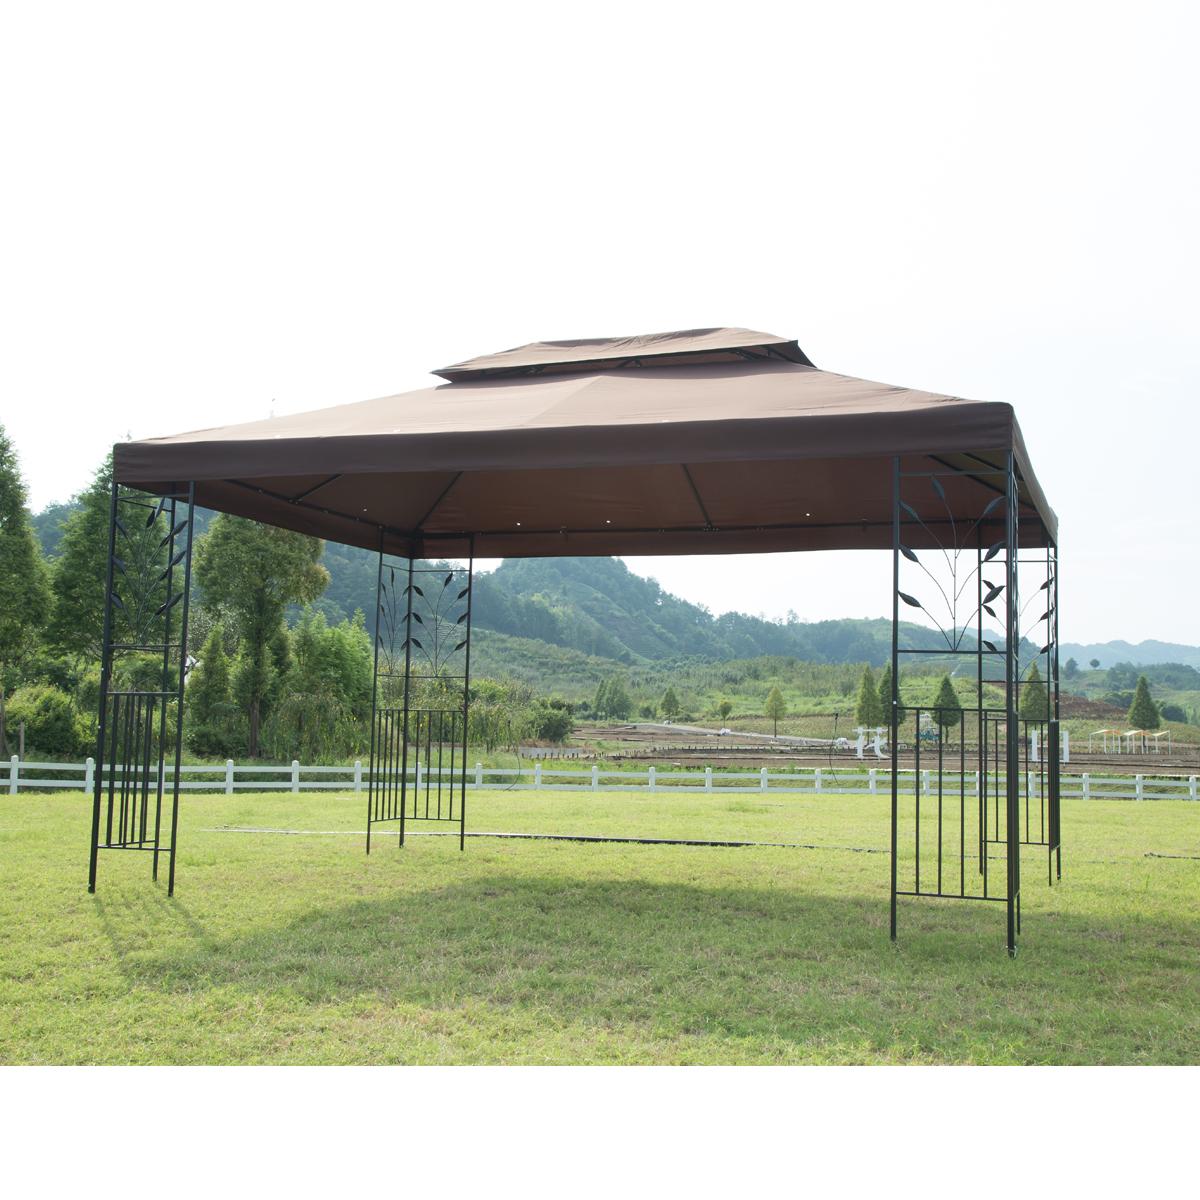 10'x10' Outdoor Metal Gazebo Mosquito Netting Screen Walls Steel Frame Vented Garden Gazebo